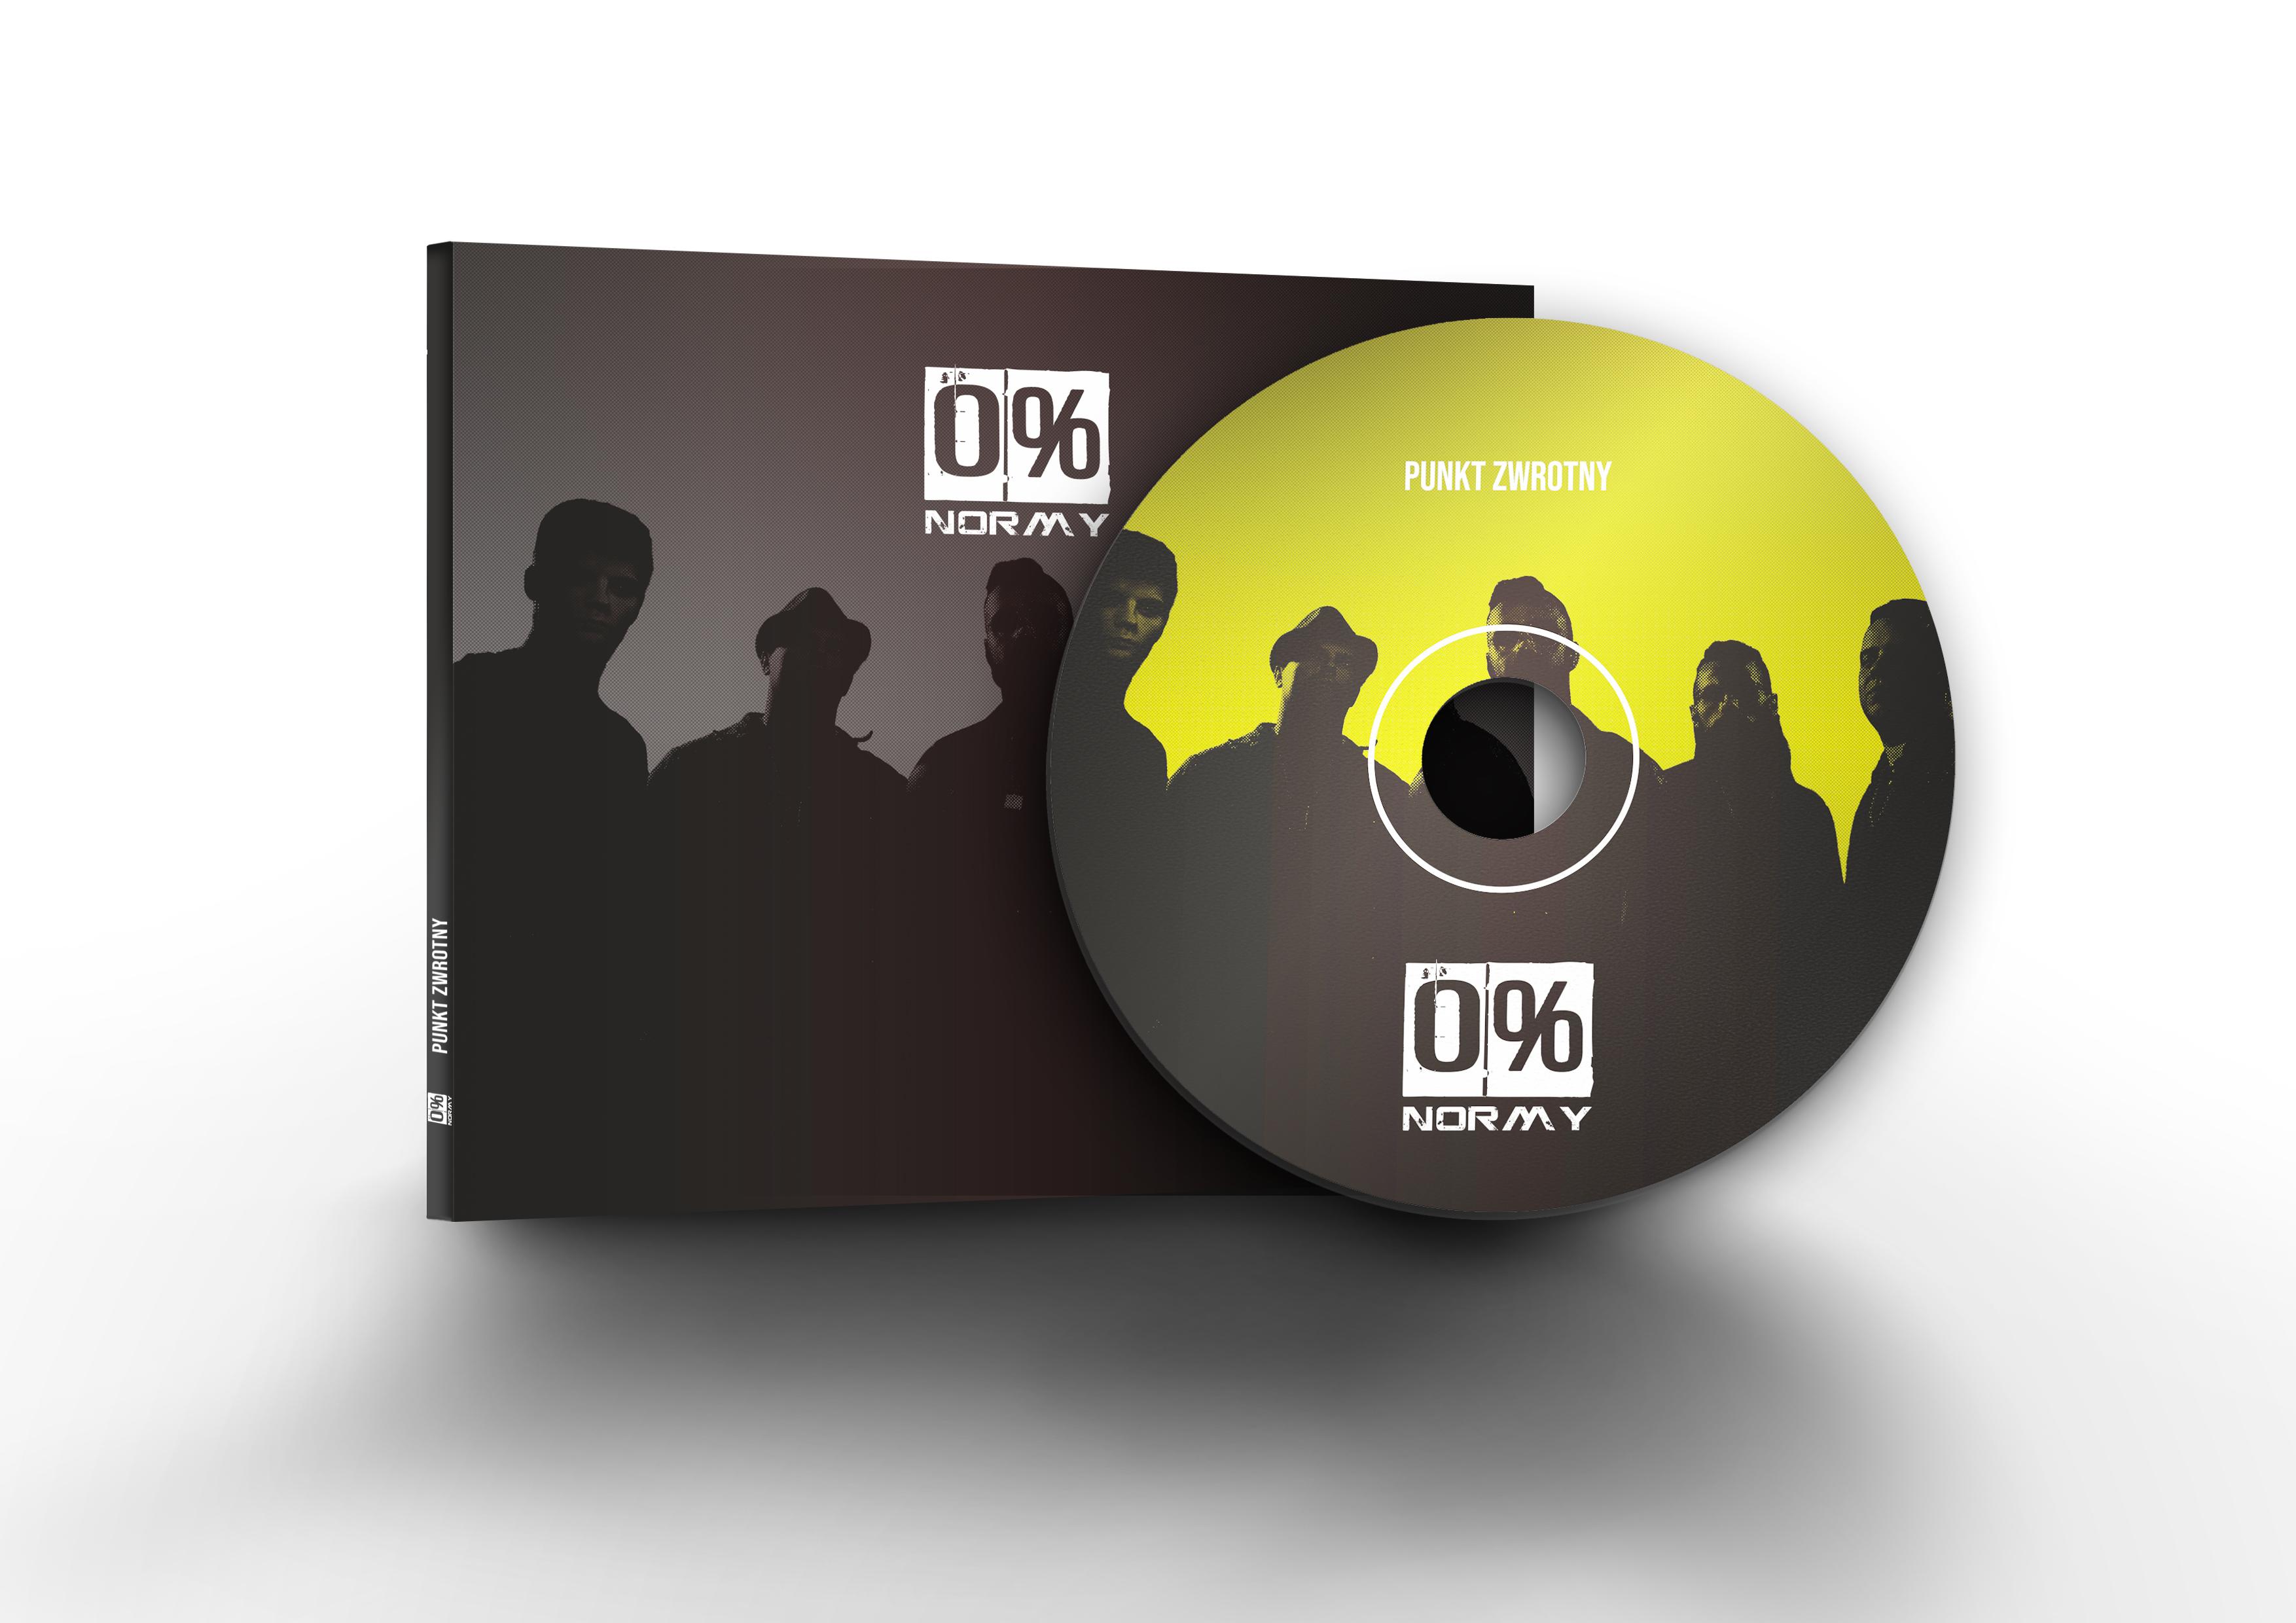 0% NORMY - Punkt zwrotny | CD